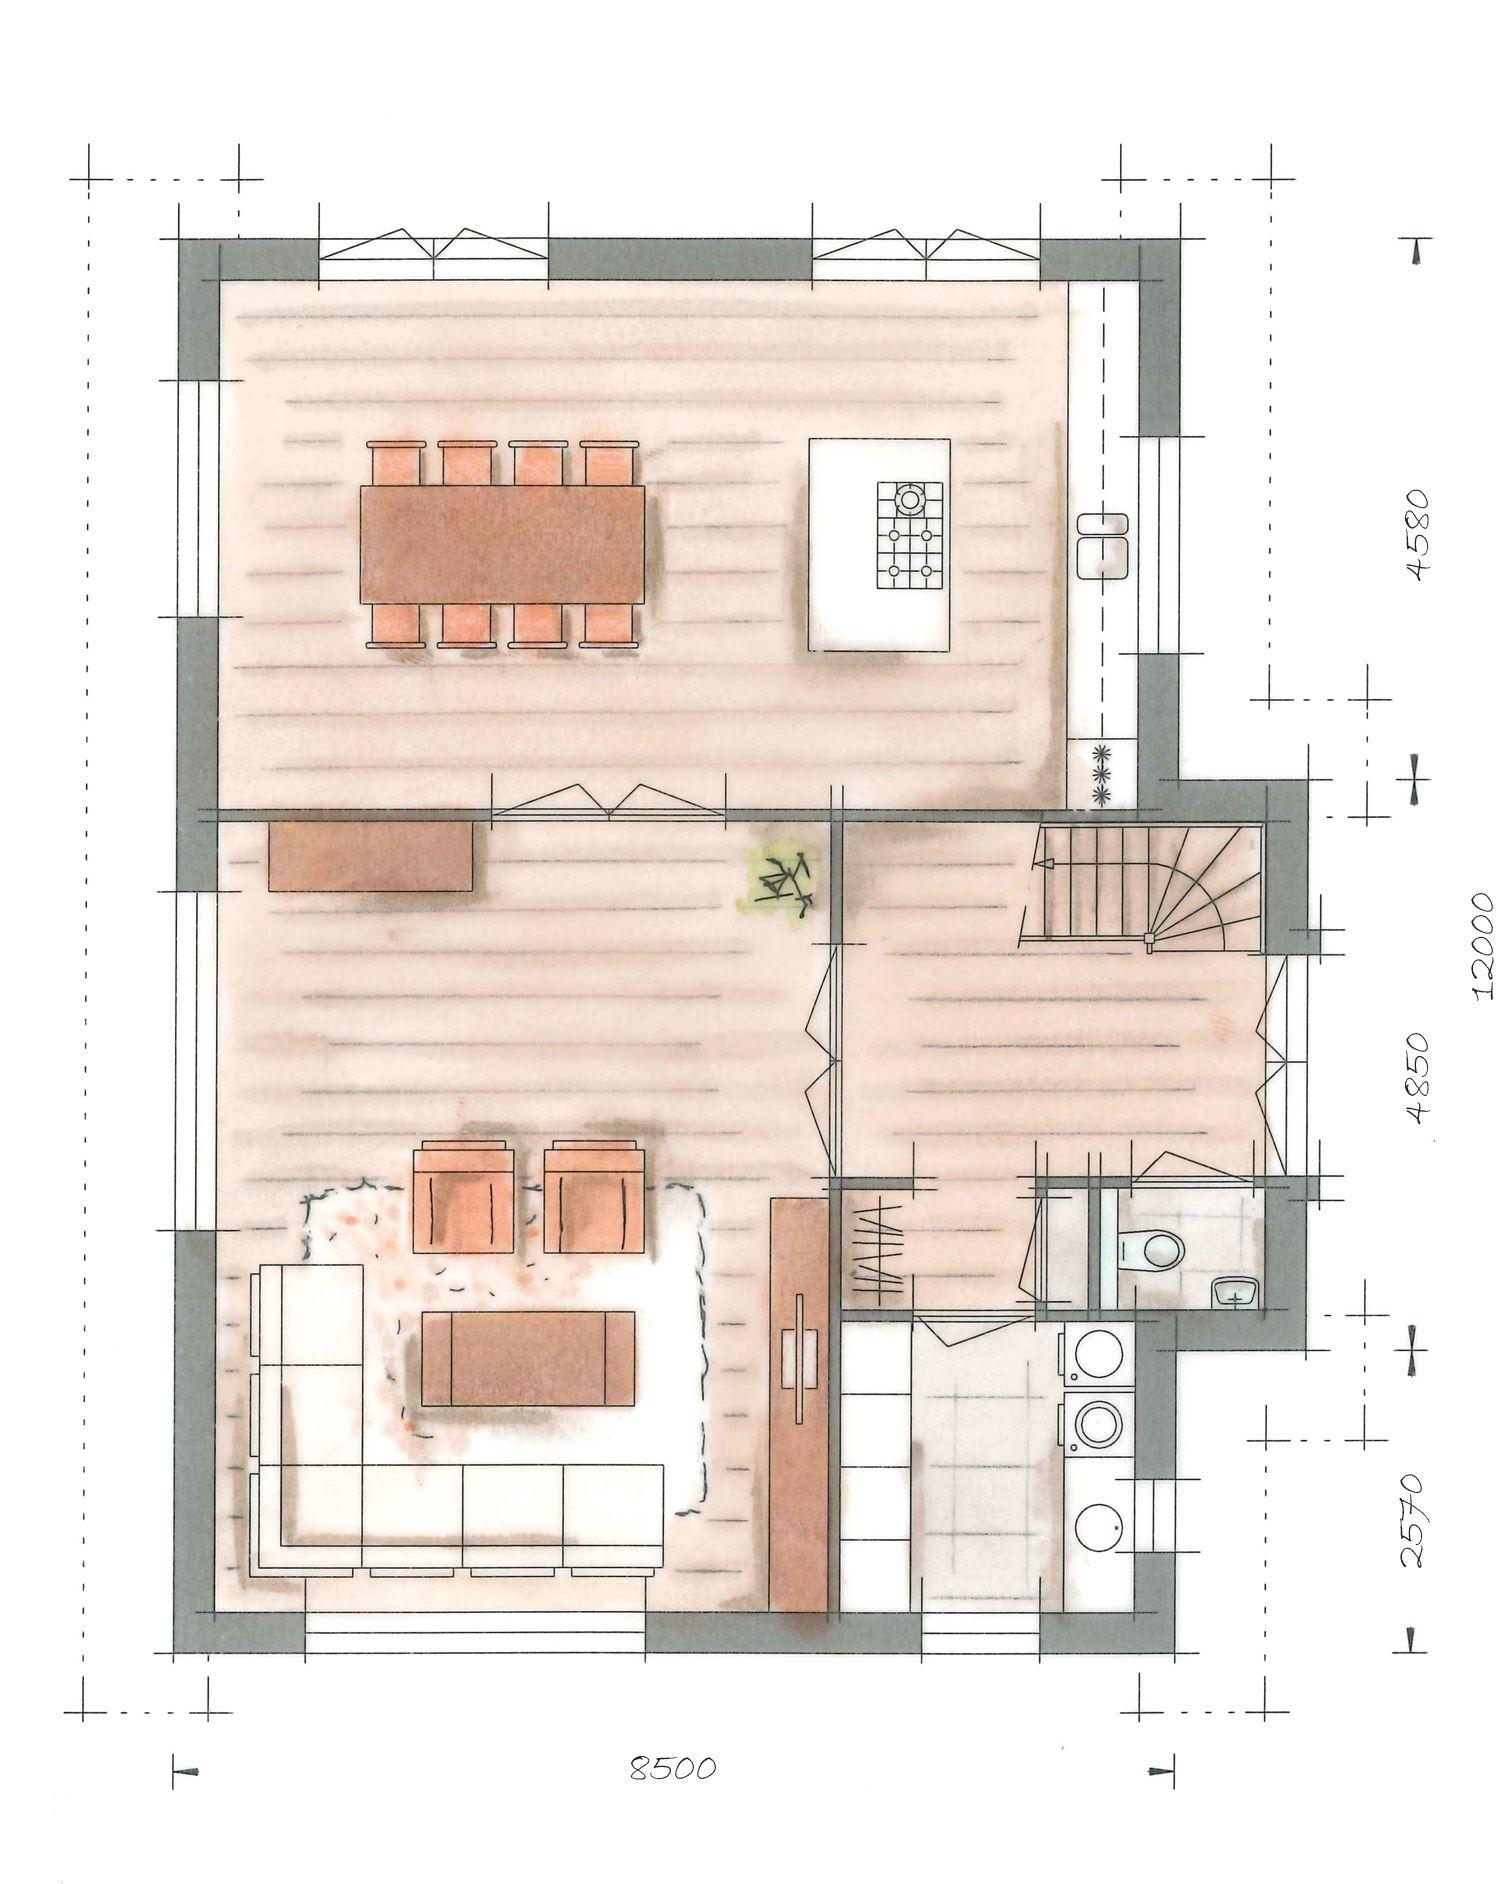 Villa groot koolwitje plattegrond begane grond notaris for Trap tekenen plattegrond